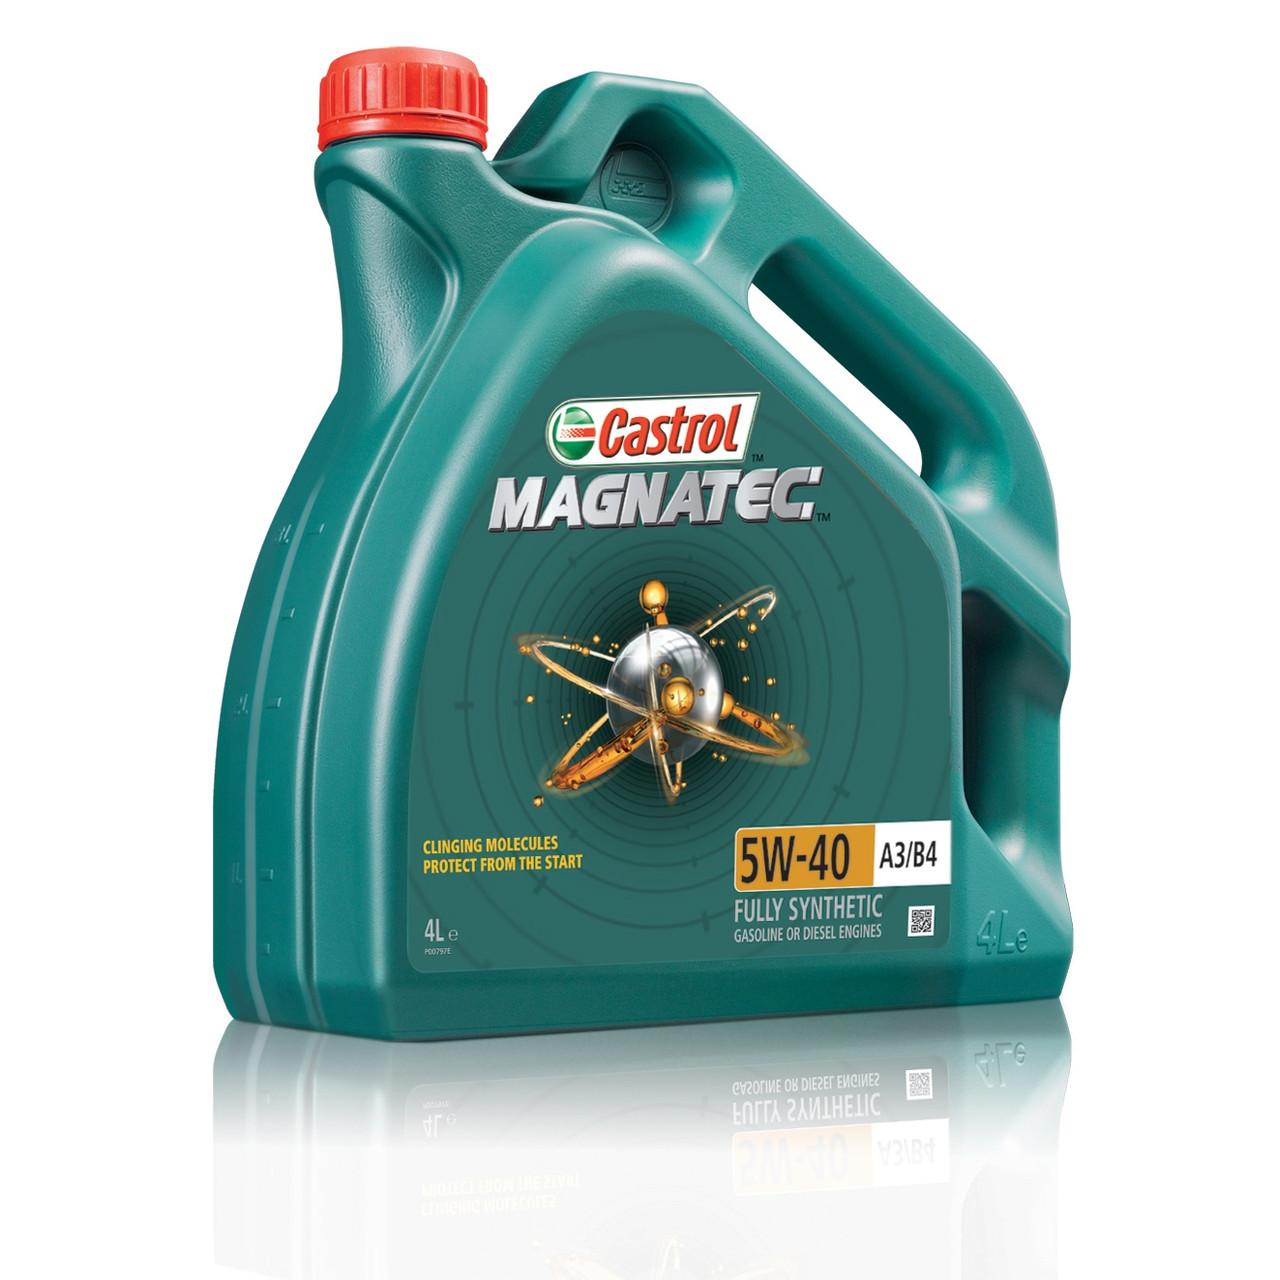 Синтетическое моторное масло Castrol magnatec 5w-40 A3/B4 4L